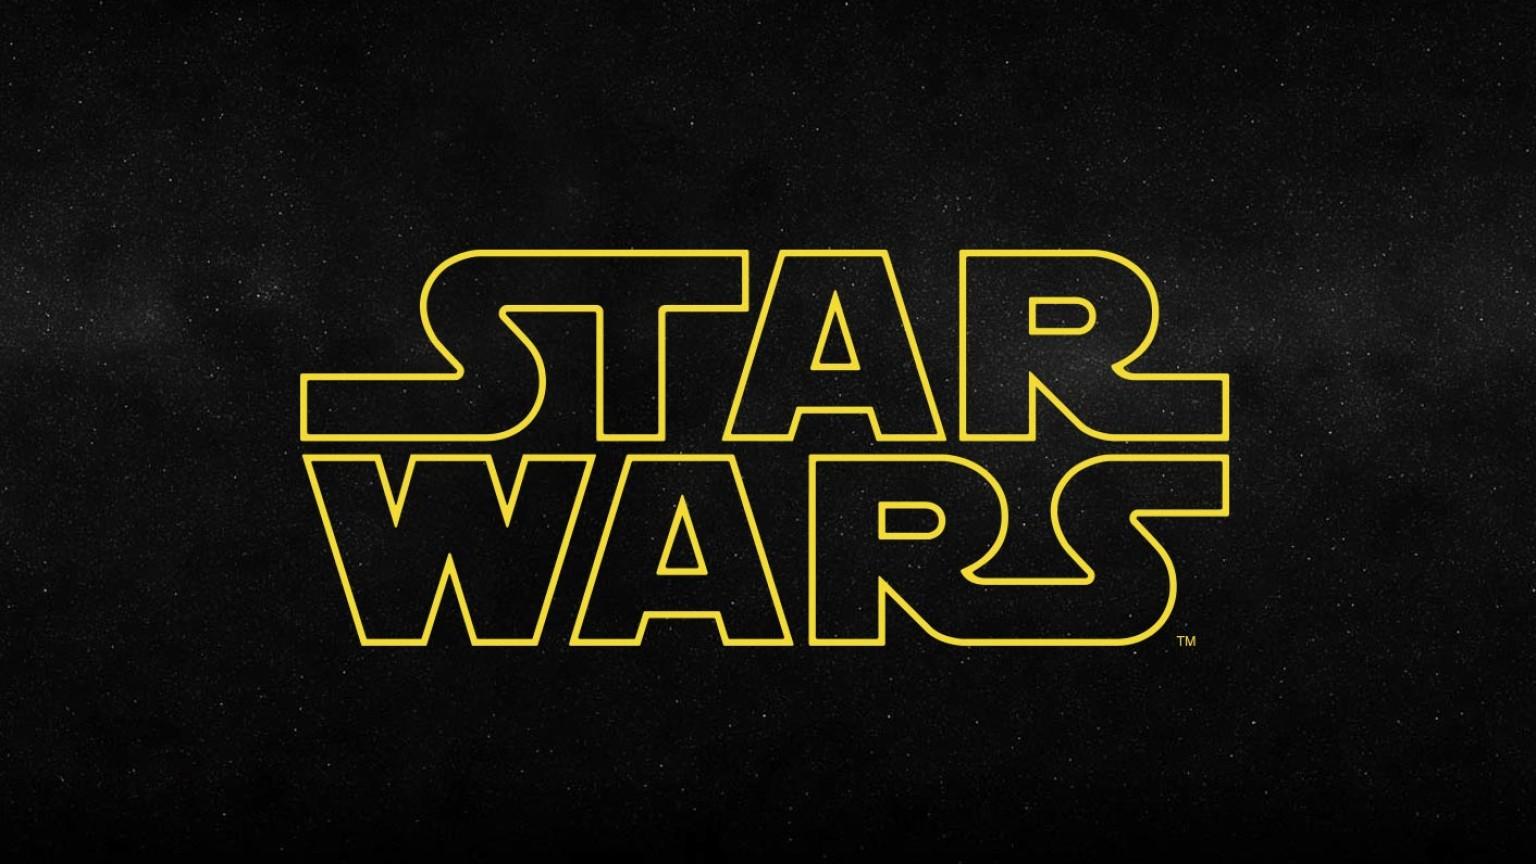 Star Wars Episode VIII Filming